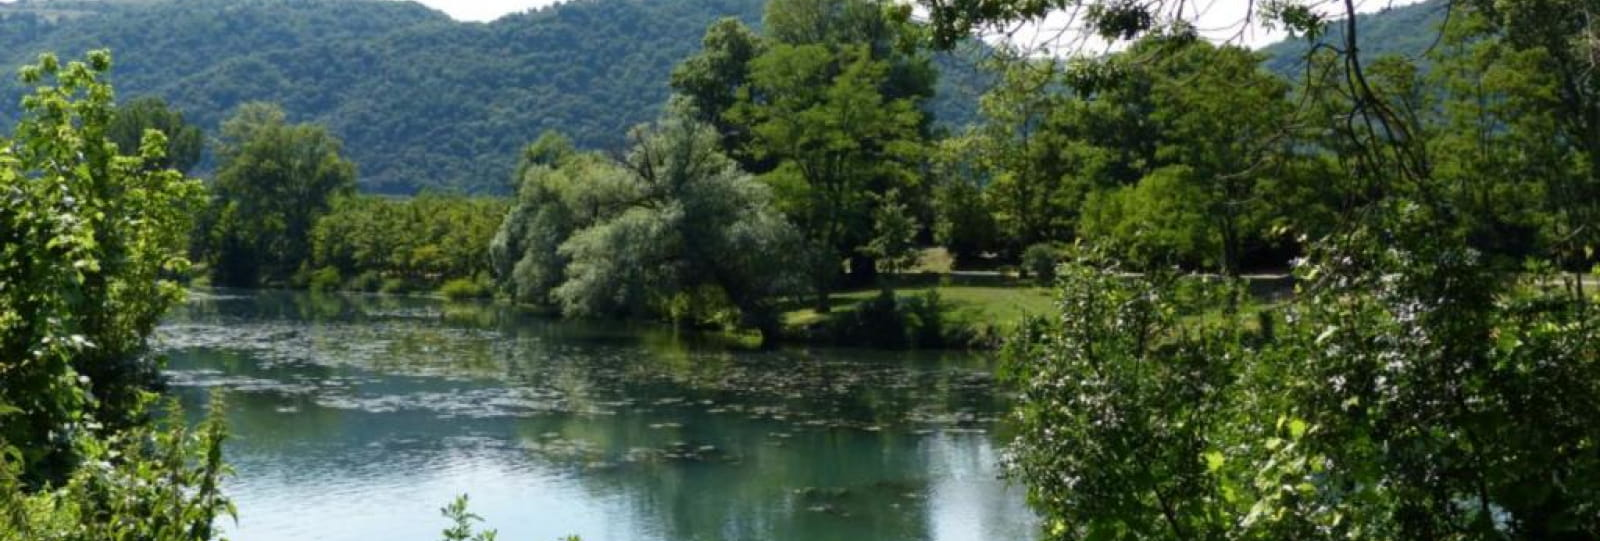 Bassin des Musards